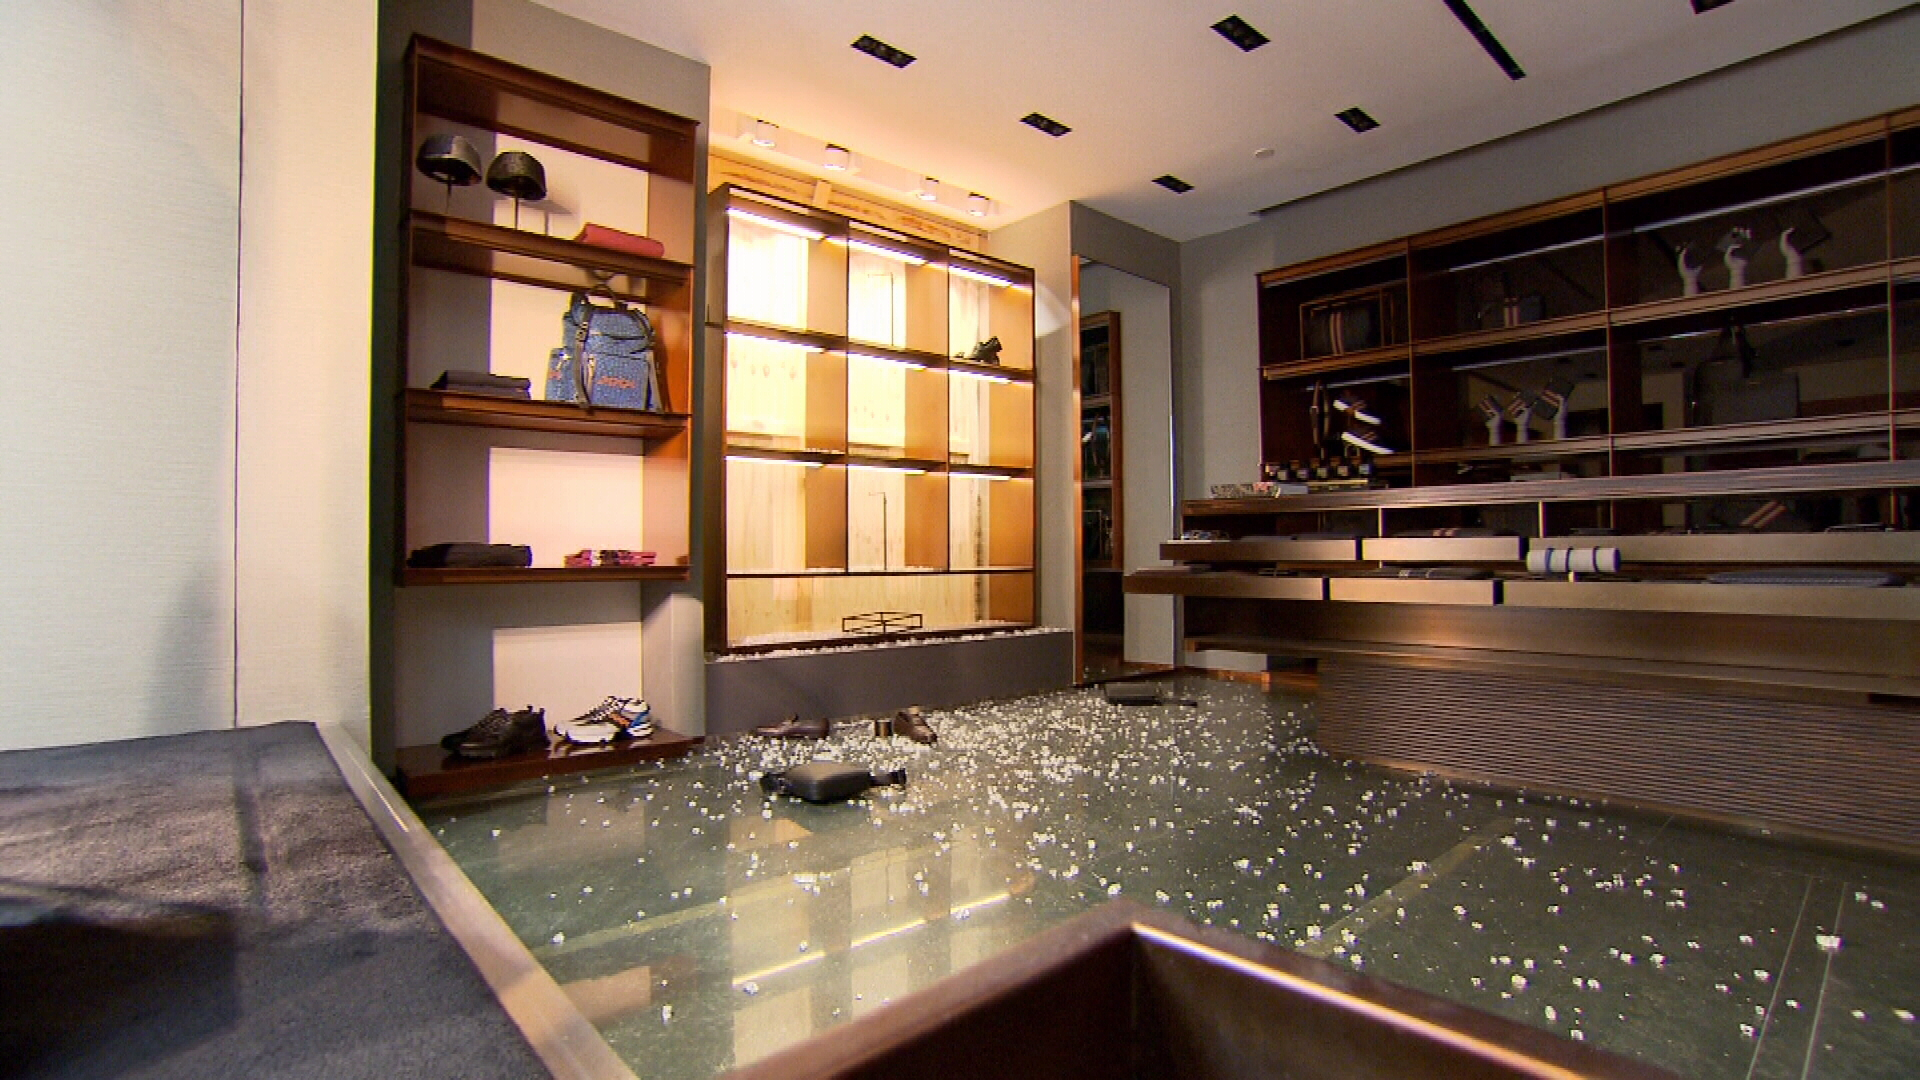 Ermenegildo Zegna loses $15,000 in luxury items in brazen smash-and-grab